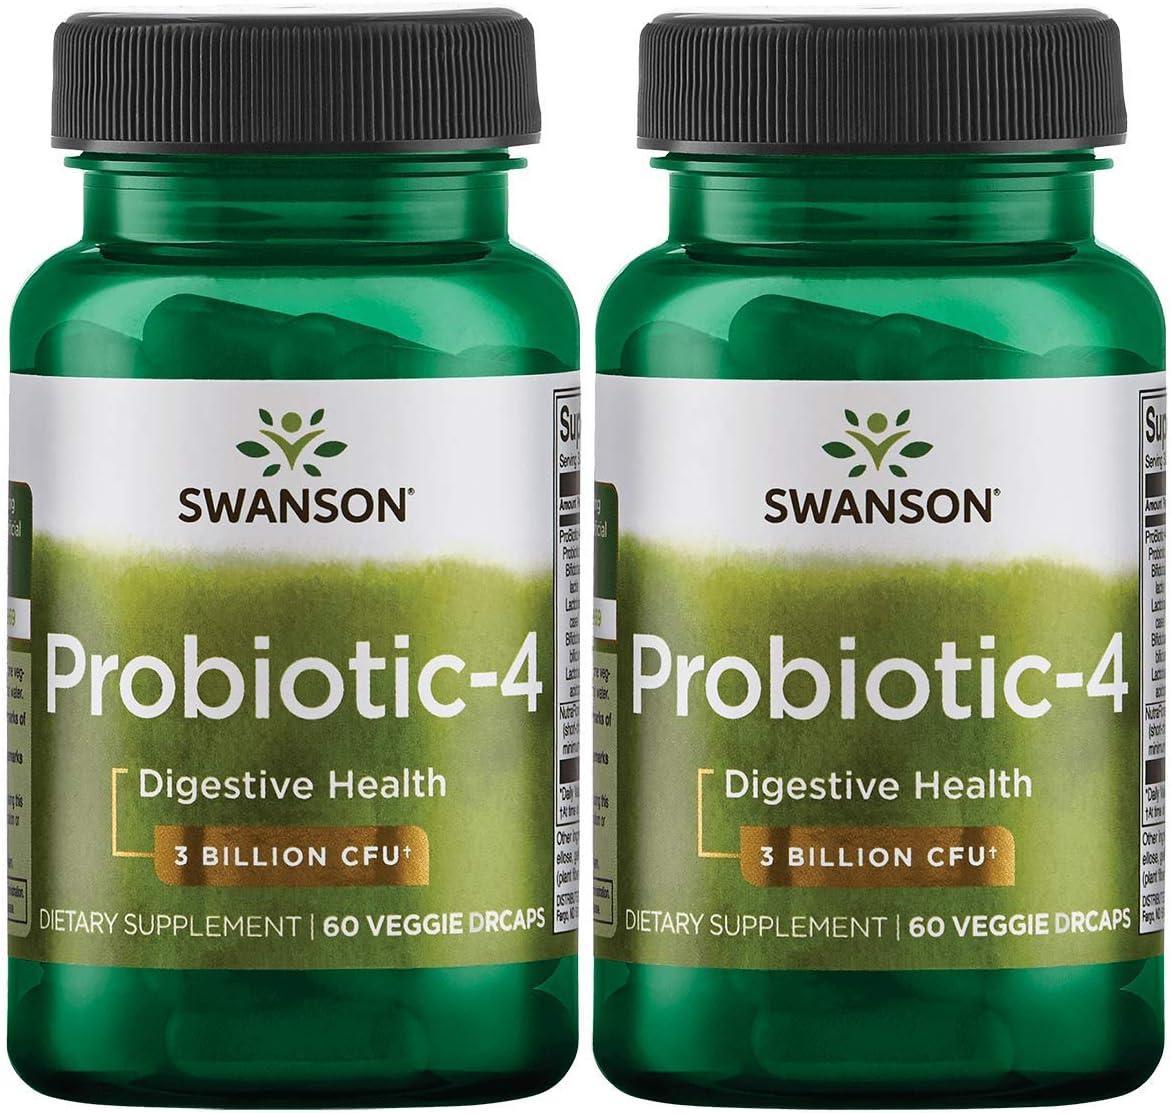 Swanson Probiotic-4 3 Billion Cfu Veg Pack 2021 model Cheap mail order shopping 60 2 Drcaps